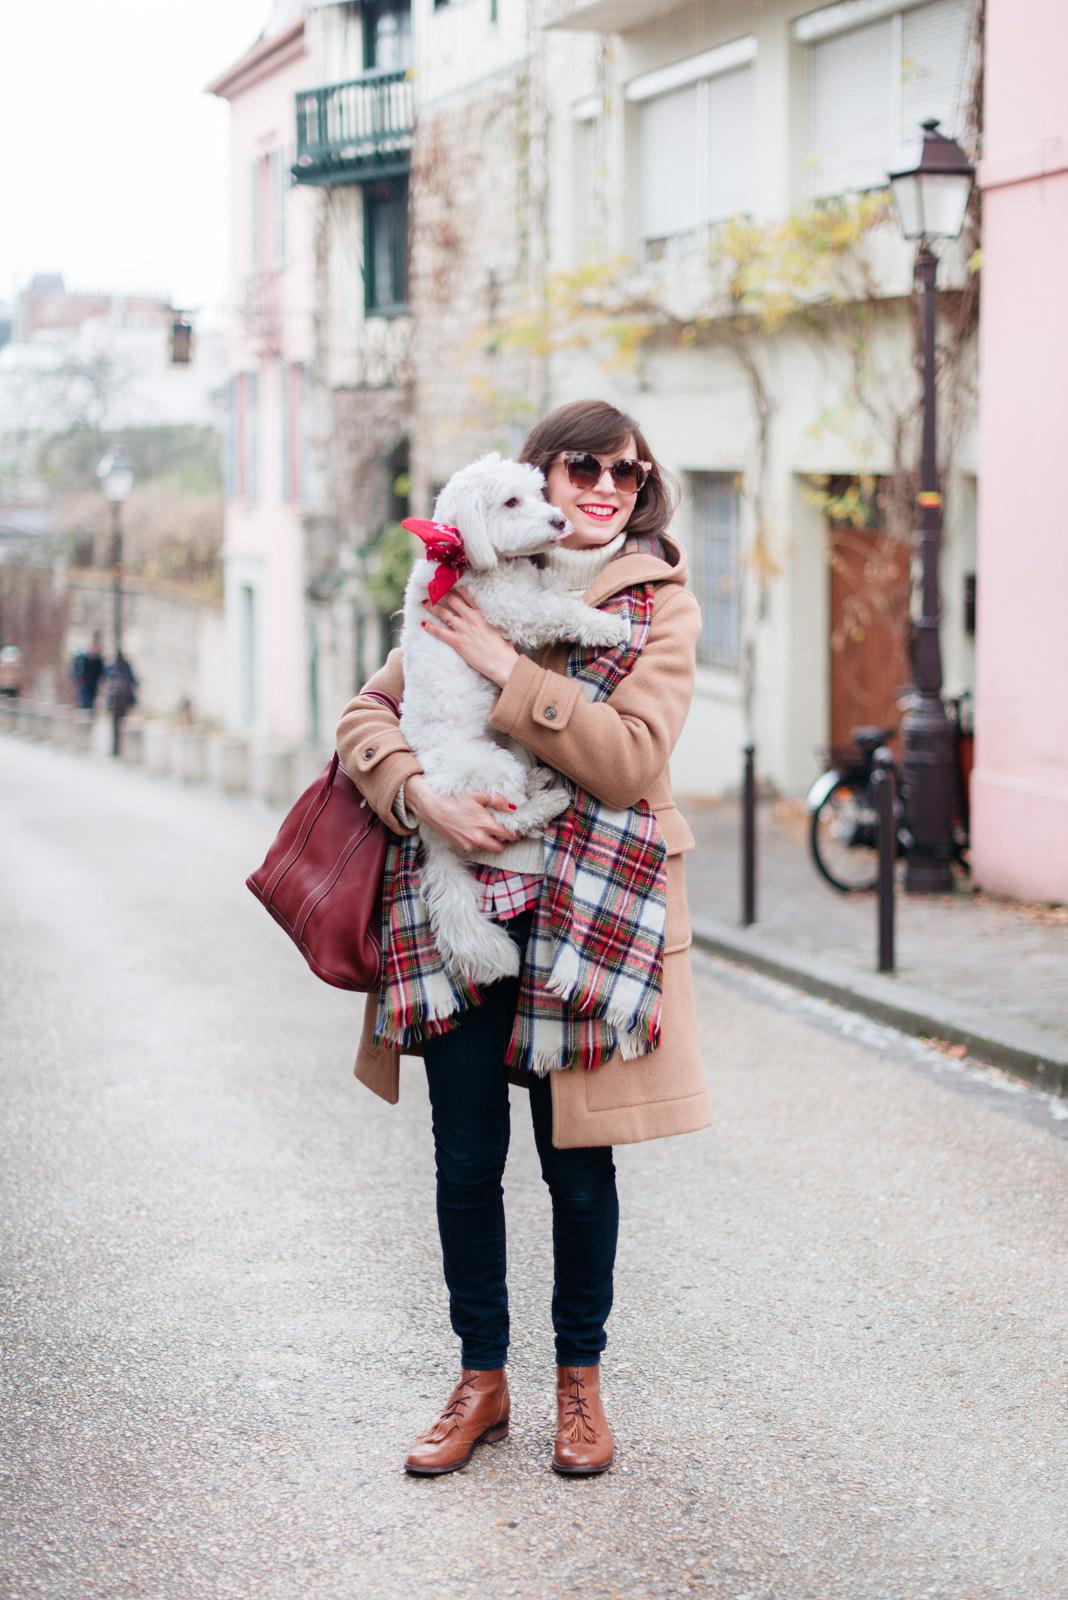 Blog-Mode-And-The-City-Looks-La-Maison-Rose-10